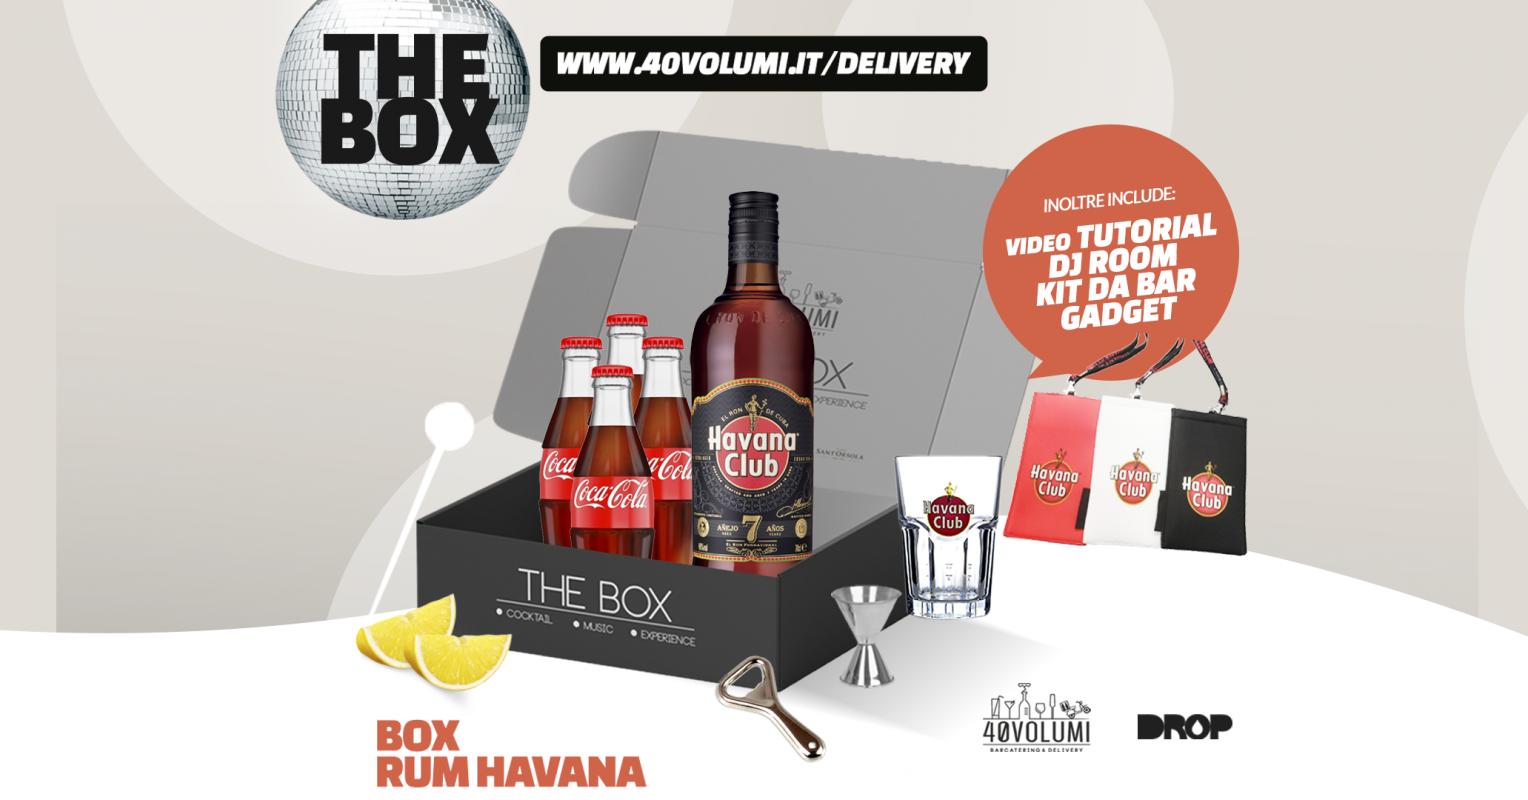 box rum havana per 40 volumi